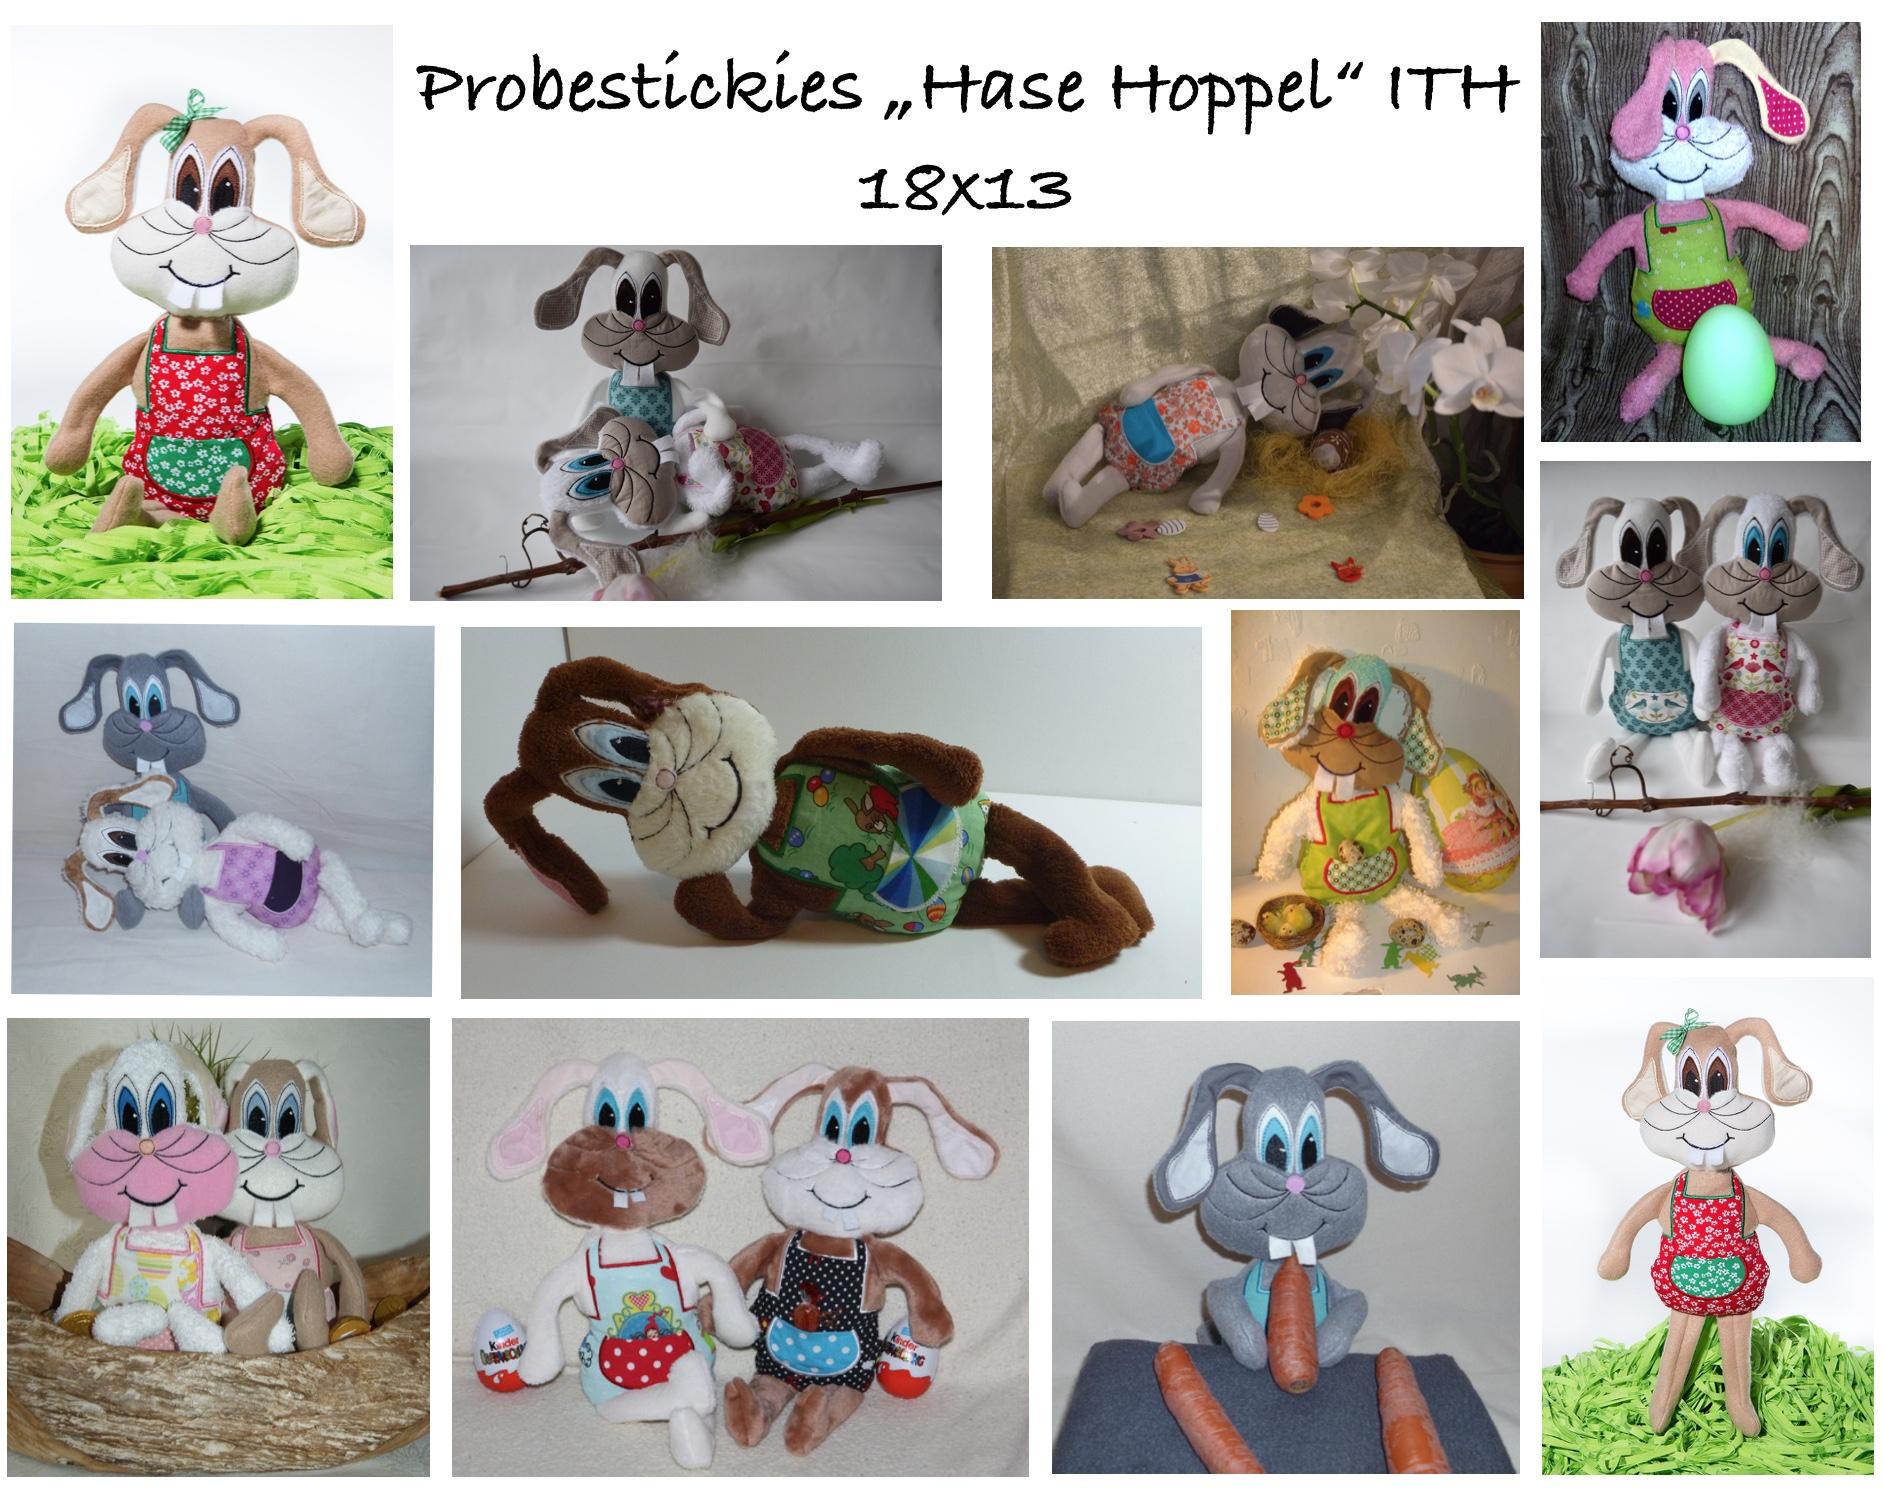 Probestickies Hase Hoppel